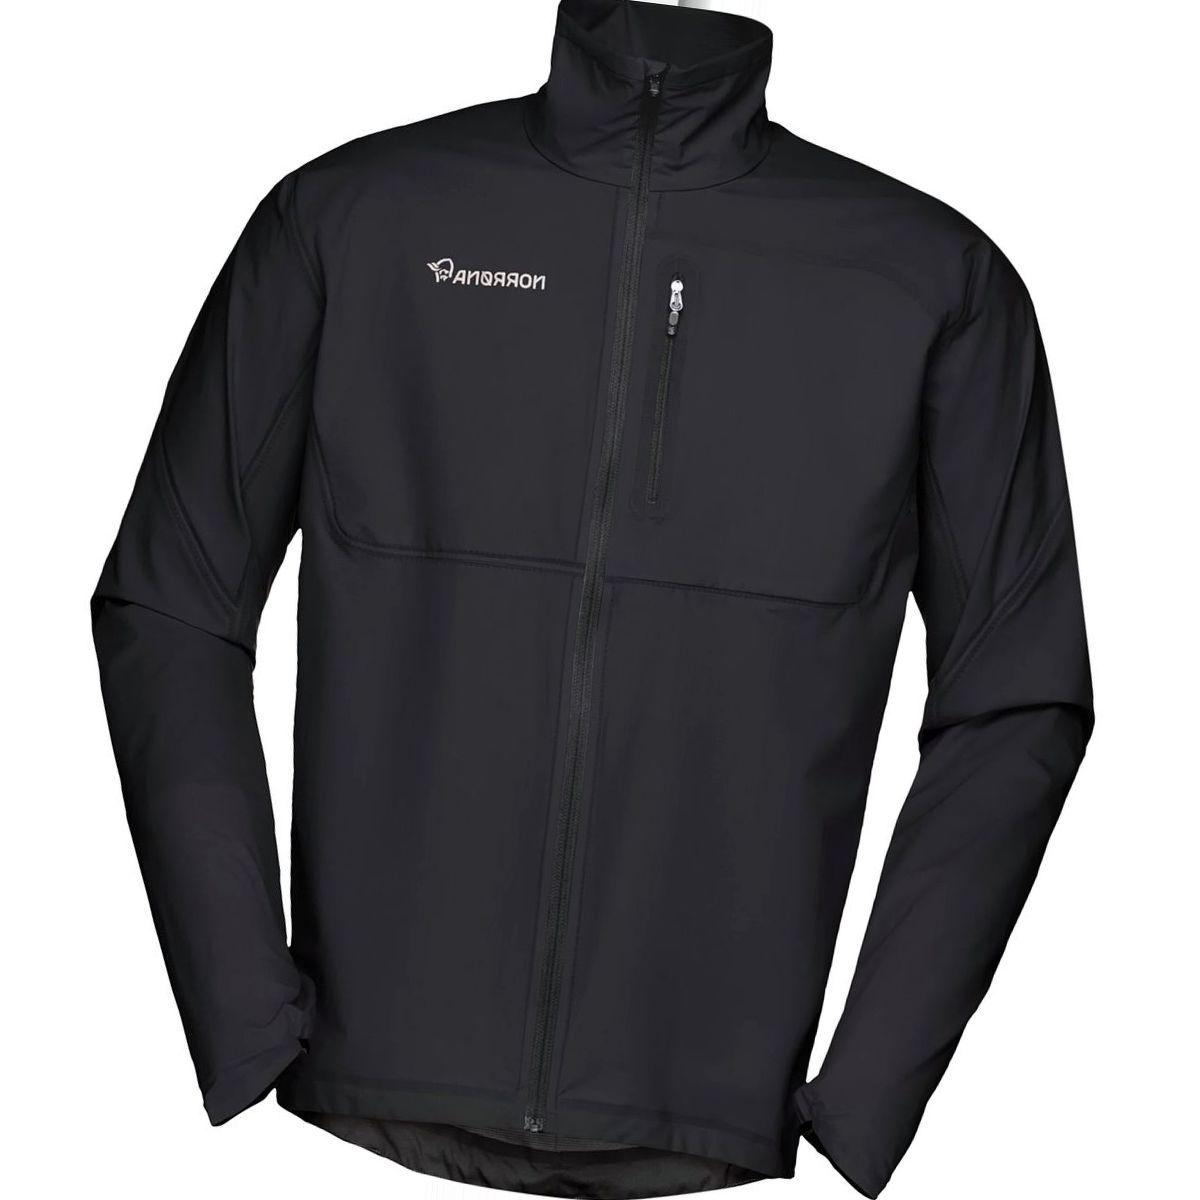 Norrona Bitihorn Aero100 Jacket - Men's